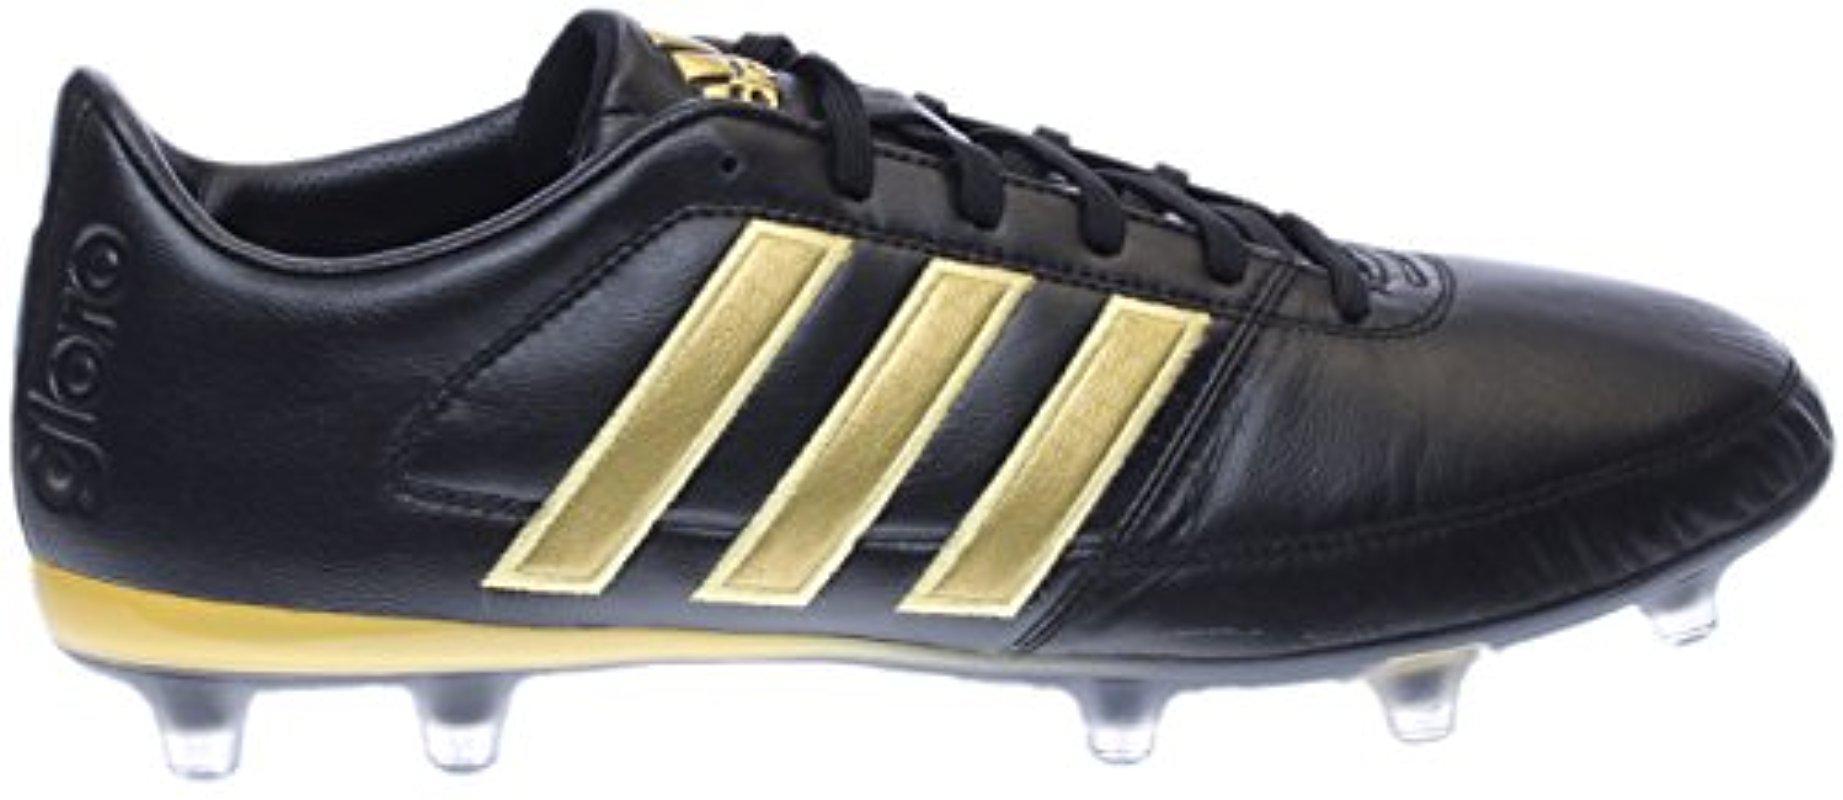 Lyst - Adidas Originals Adidas Performance Gloro 16.1 Fg Soccer Shoe ... 8d85987baca